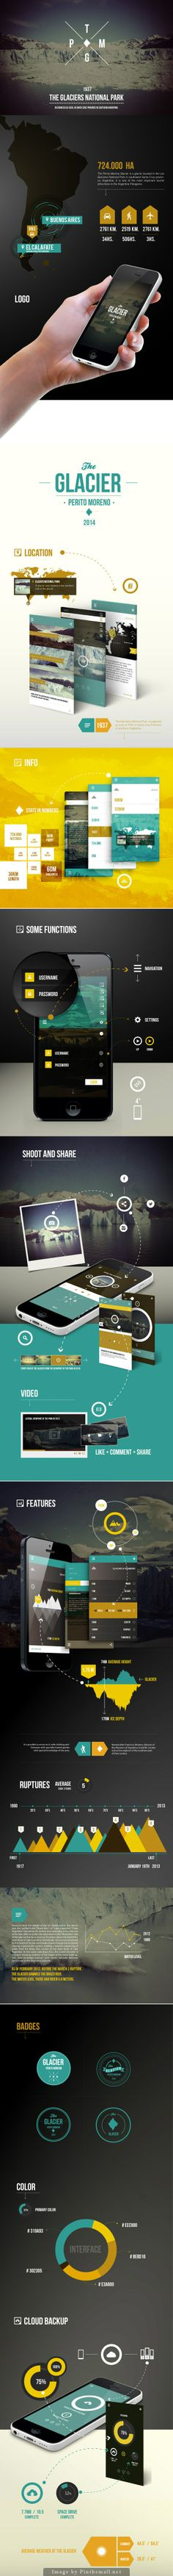 The Glacier - Mobile App Concept